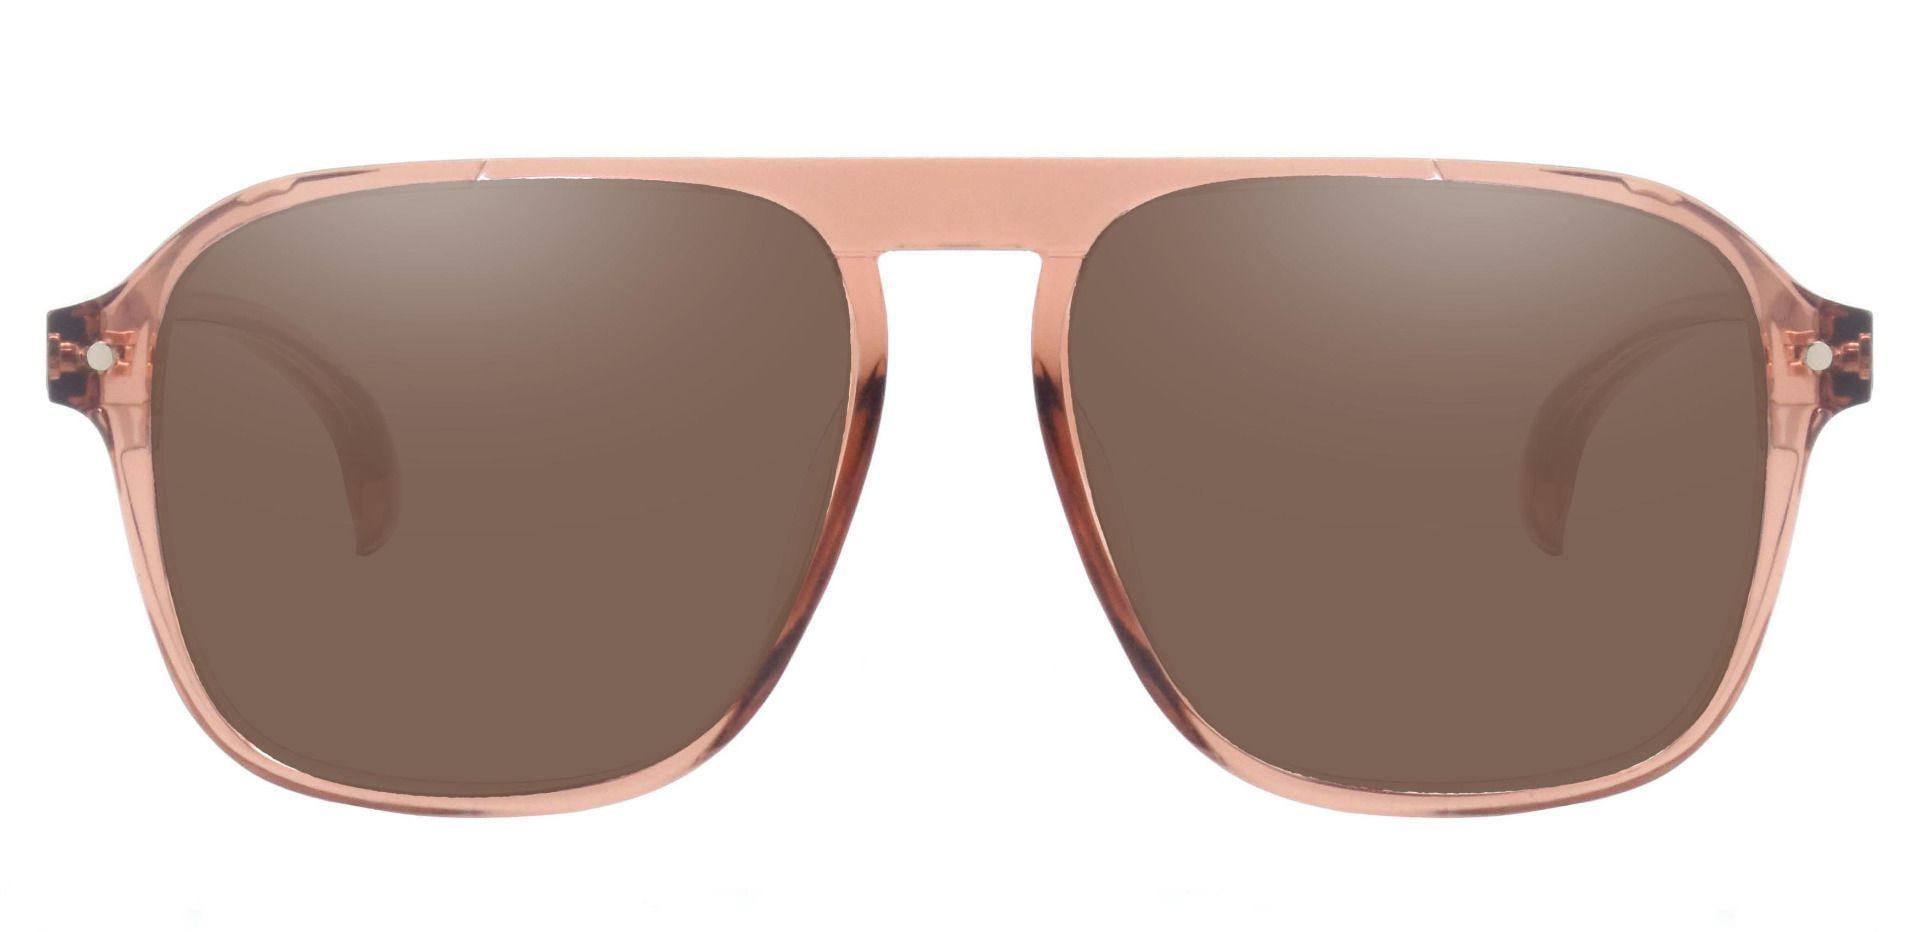 Gideon Aviator Progressive Sunglasses - Brown Frame With Brown Lenses